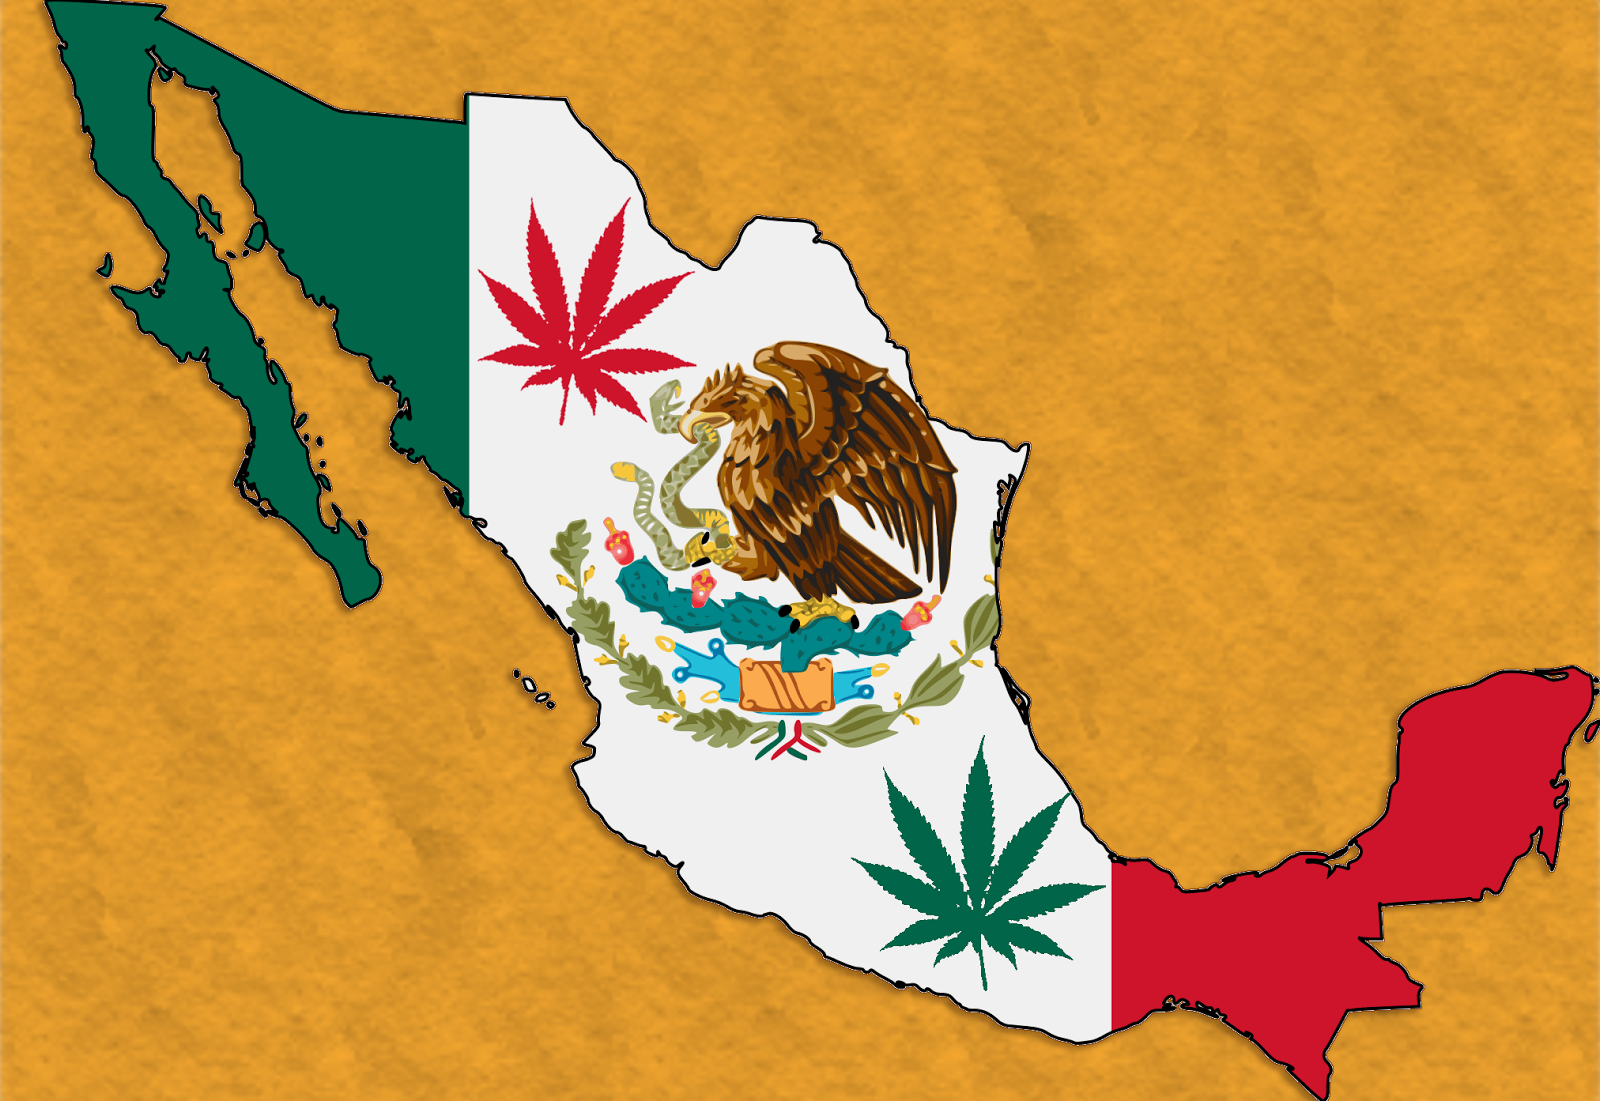 meksica_flag_map_cannabis